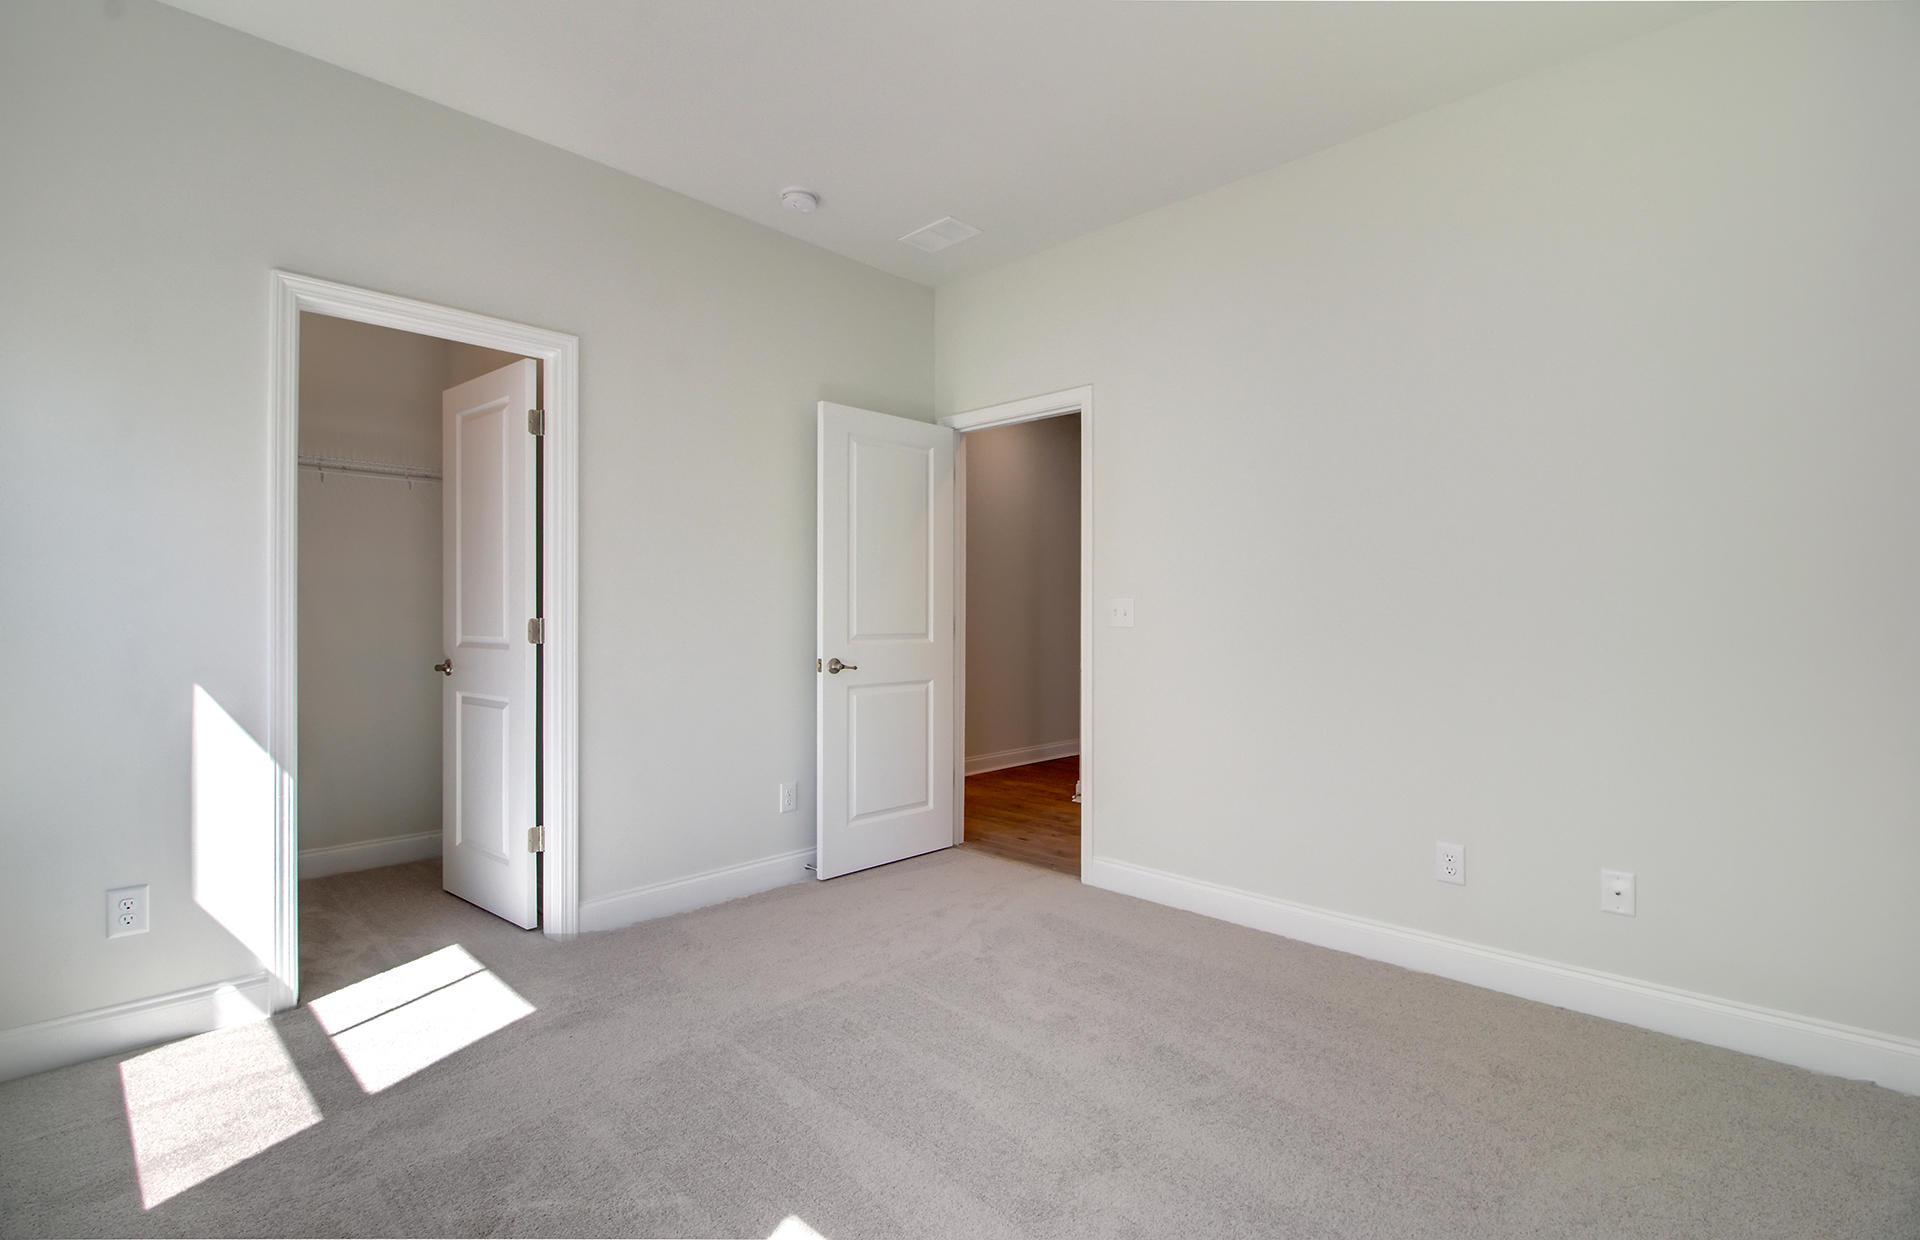 Park West Homes For Sale - 3066 Rice Field, Mount Pleasant, SC - 45